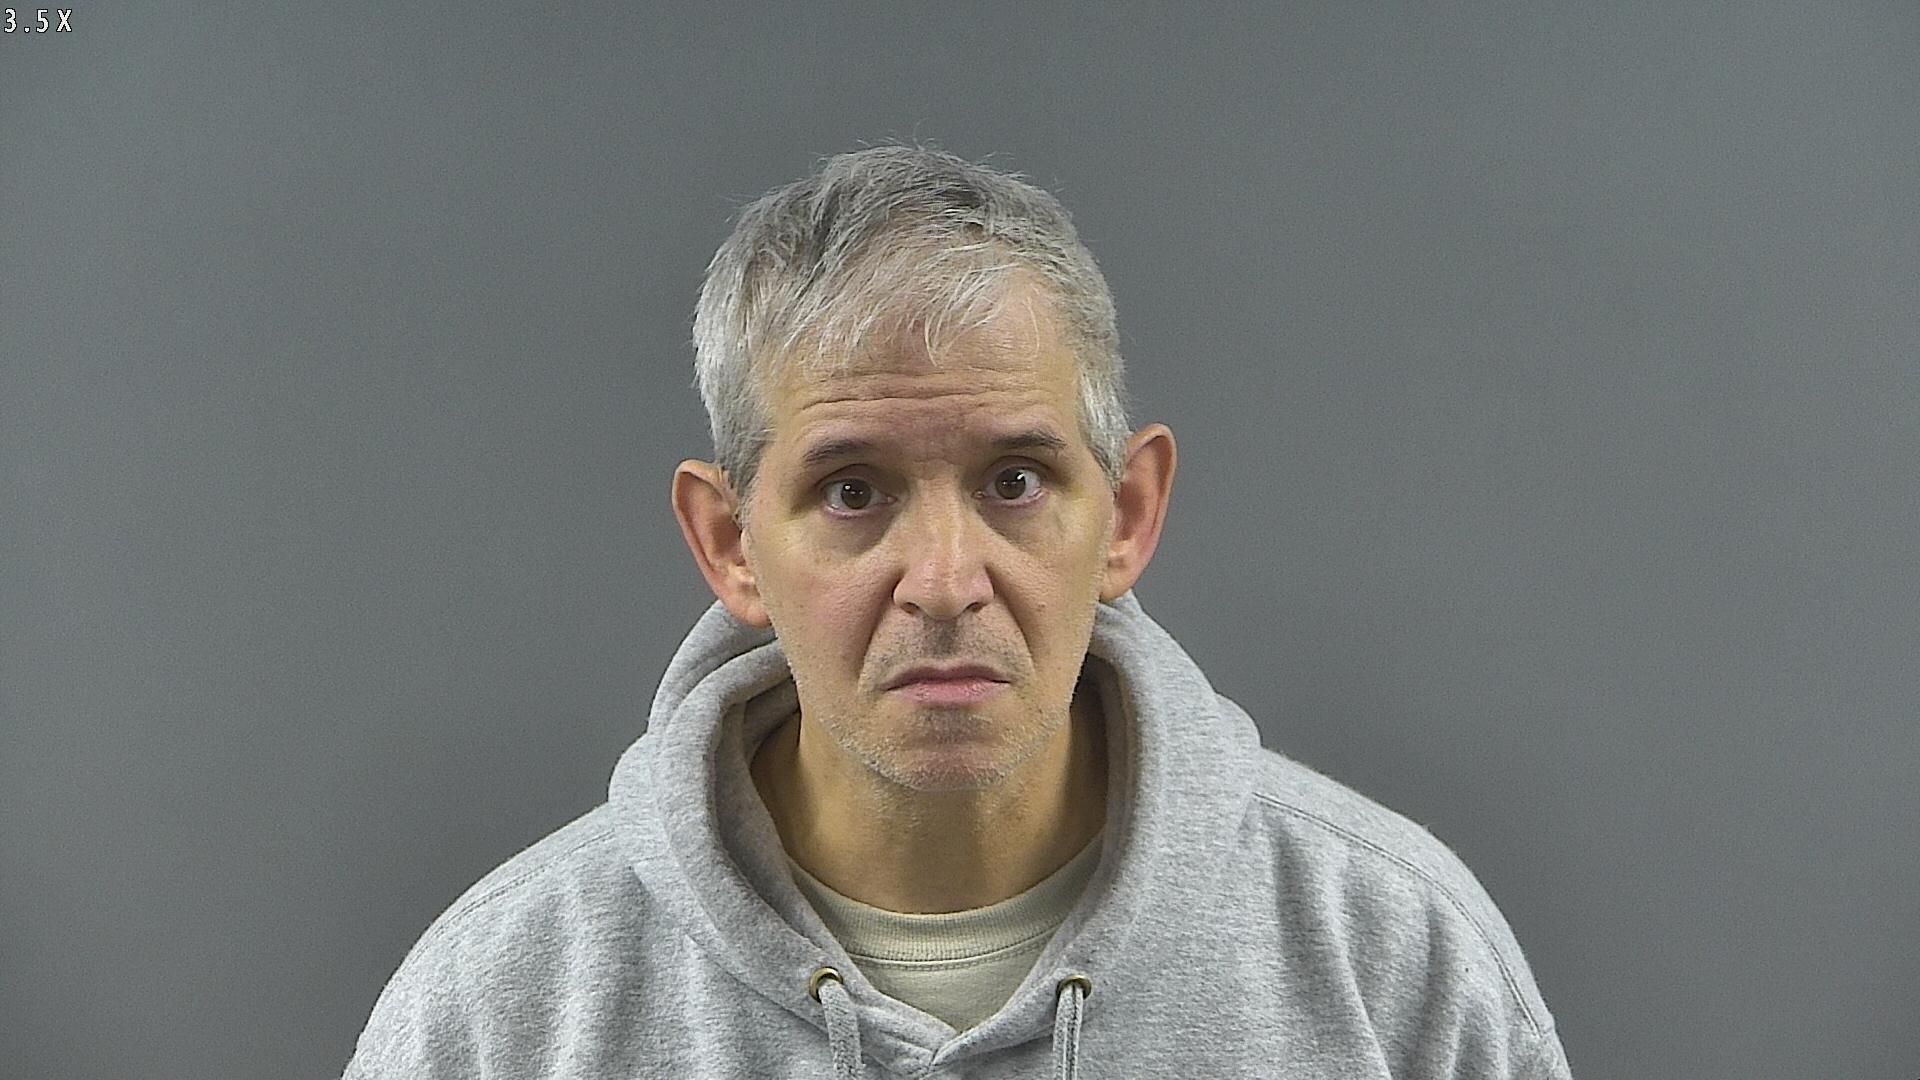 James Phillips mugshot (Warren County Regional Jail)